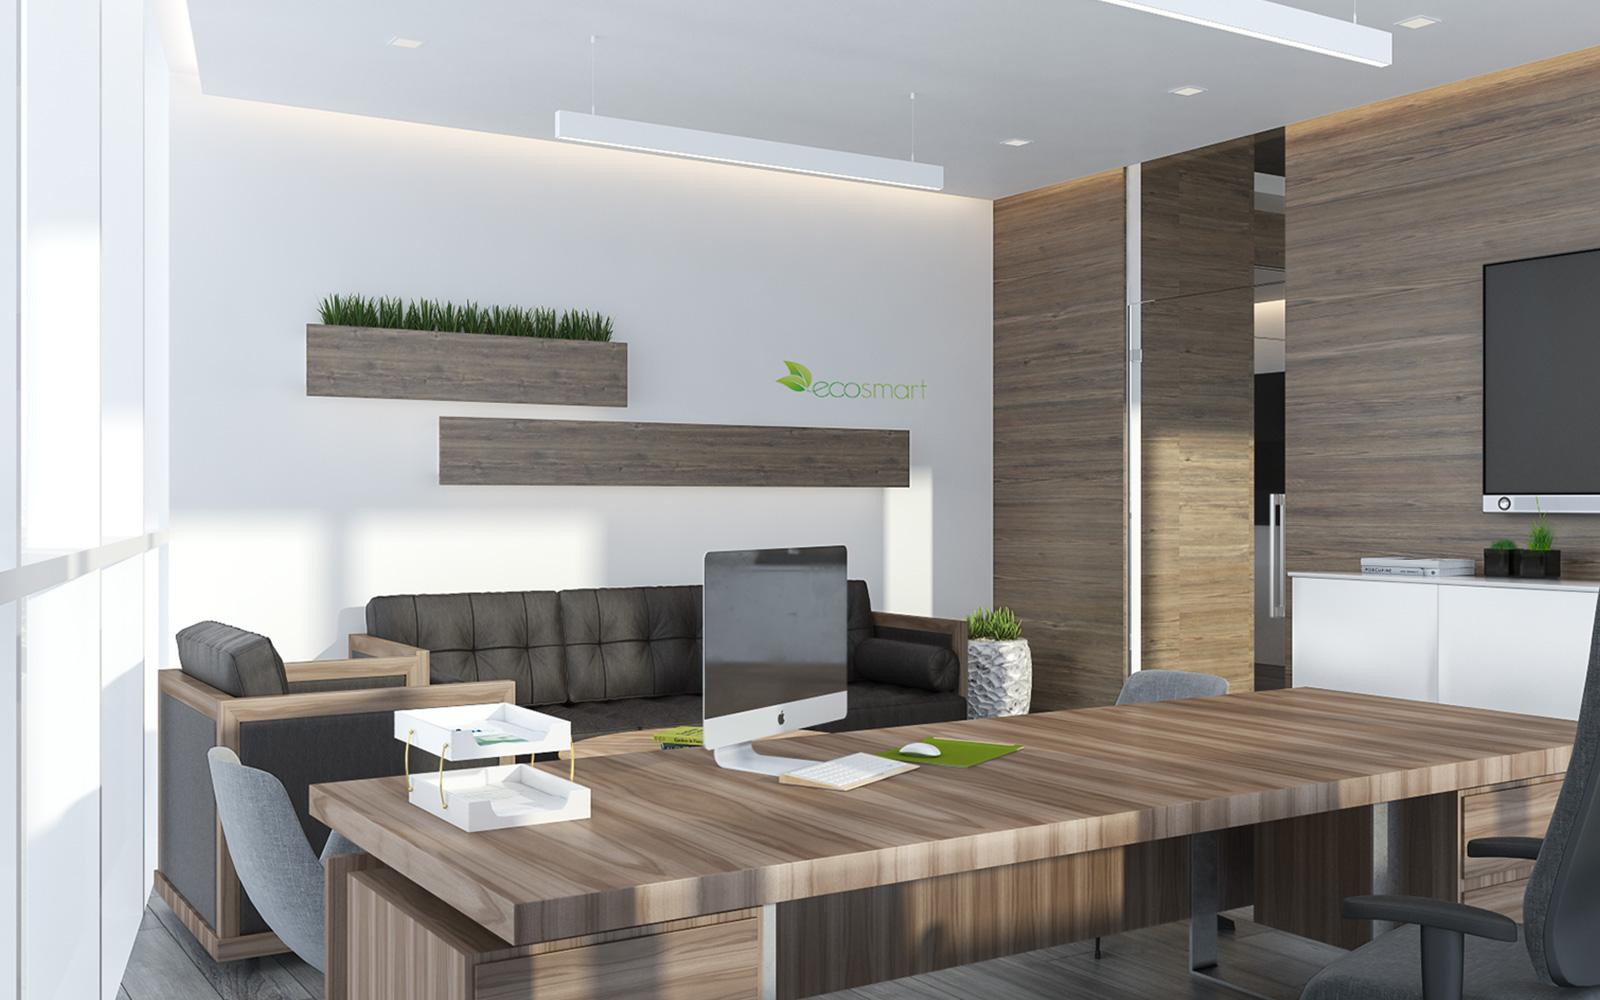 Vogue Design - Istanbul Eco Smart Office5